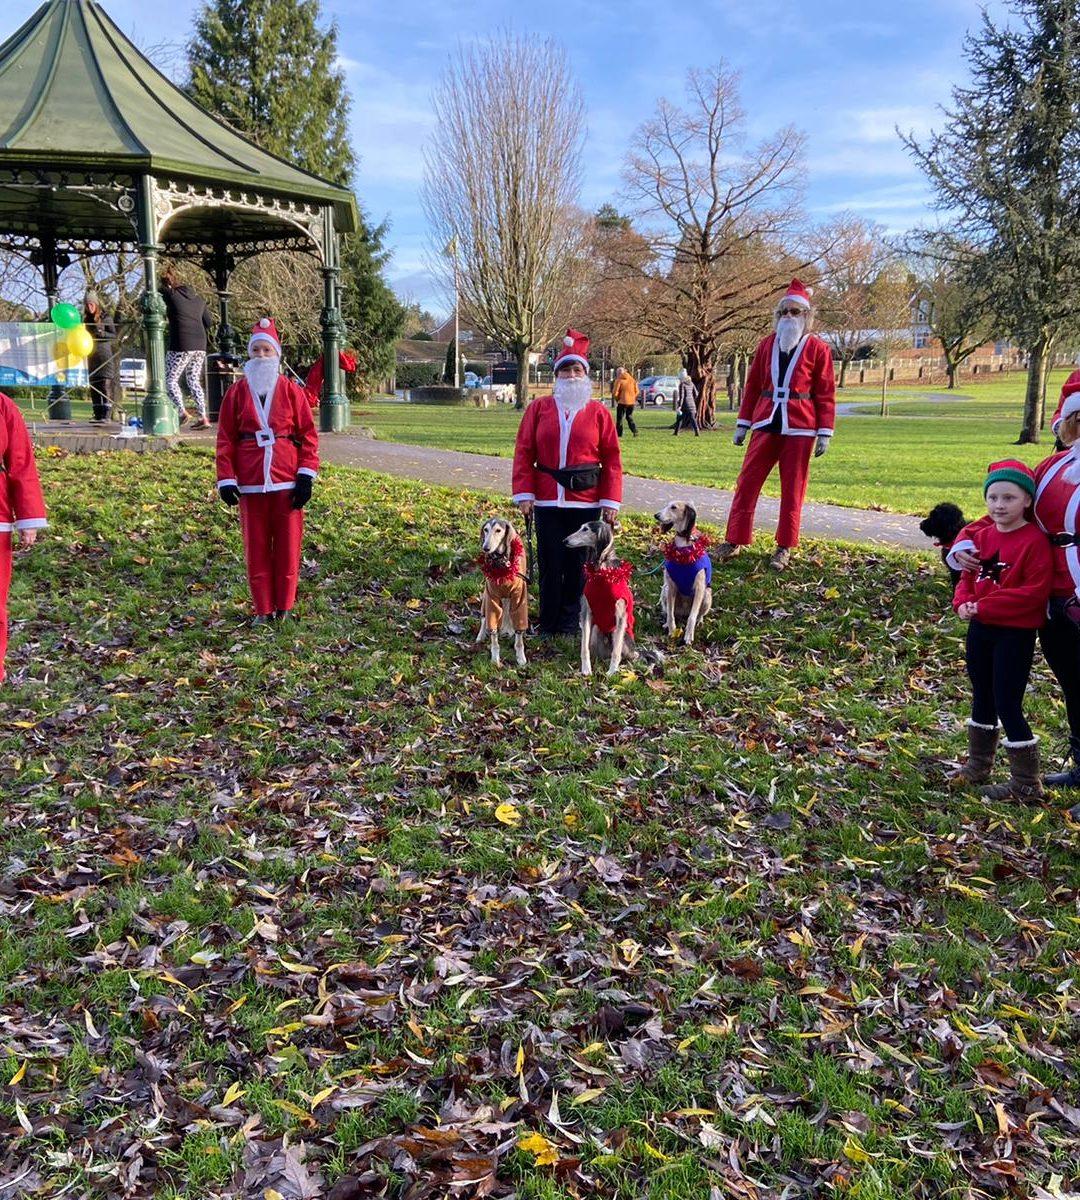 Early Christmas Present for Primrose as Santa Fun Run Raises Thousands